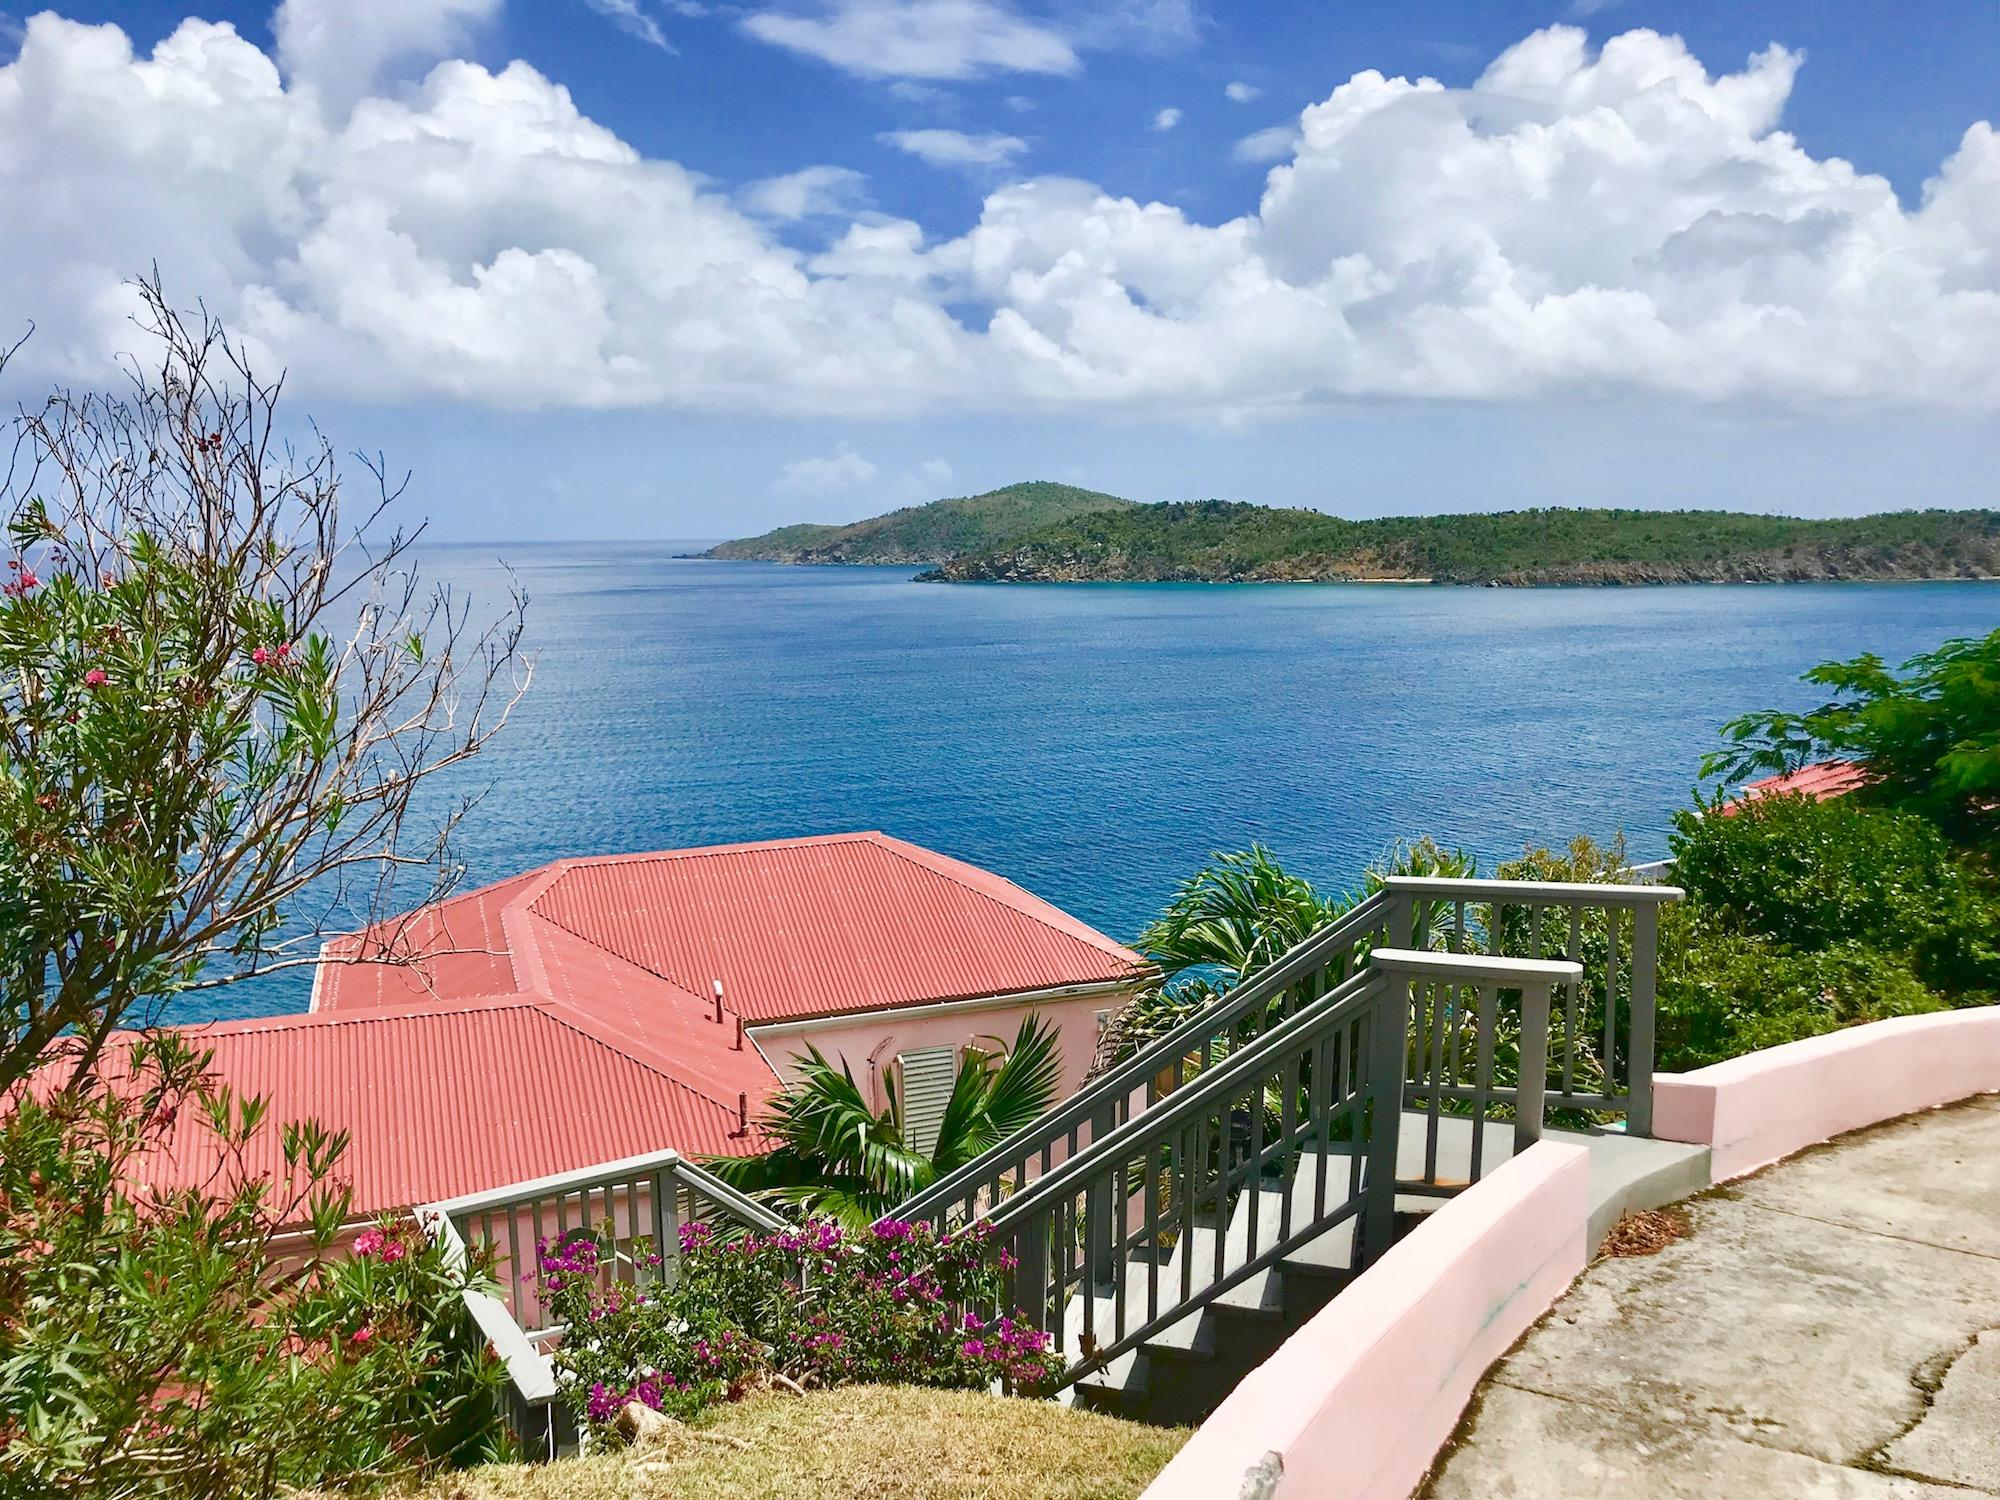 Condominium for Sale at Caret Bay Villas 11 Caret Bay LNS Caret Bay Villas 11 Caret Bay LNS St Thomas, Virgin Islands 00802 United States Virgin Islands